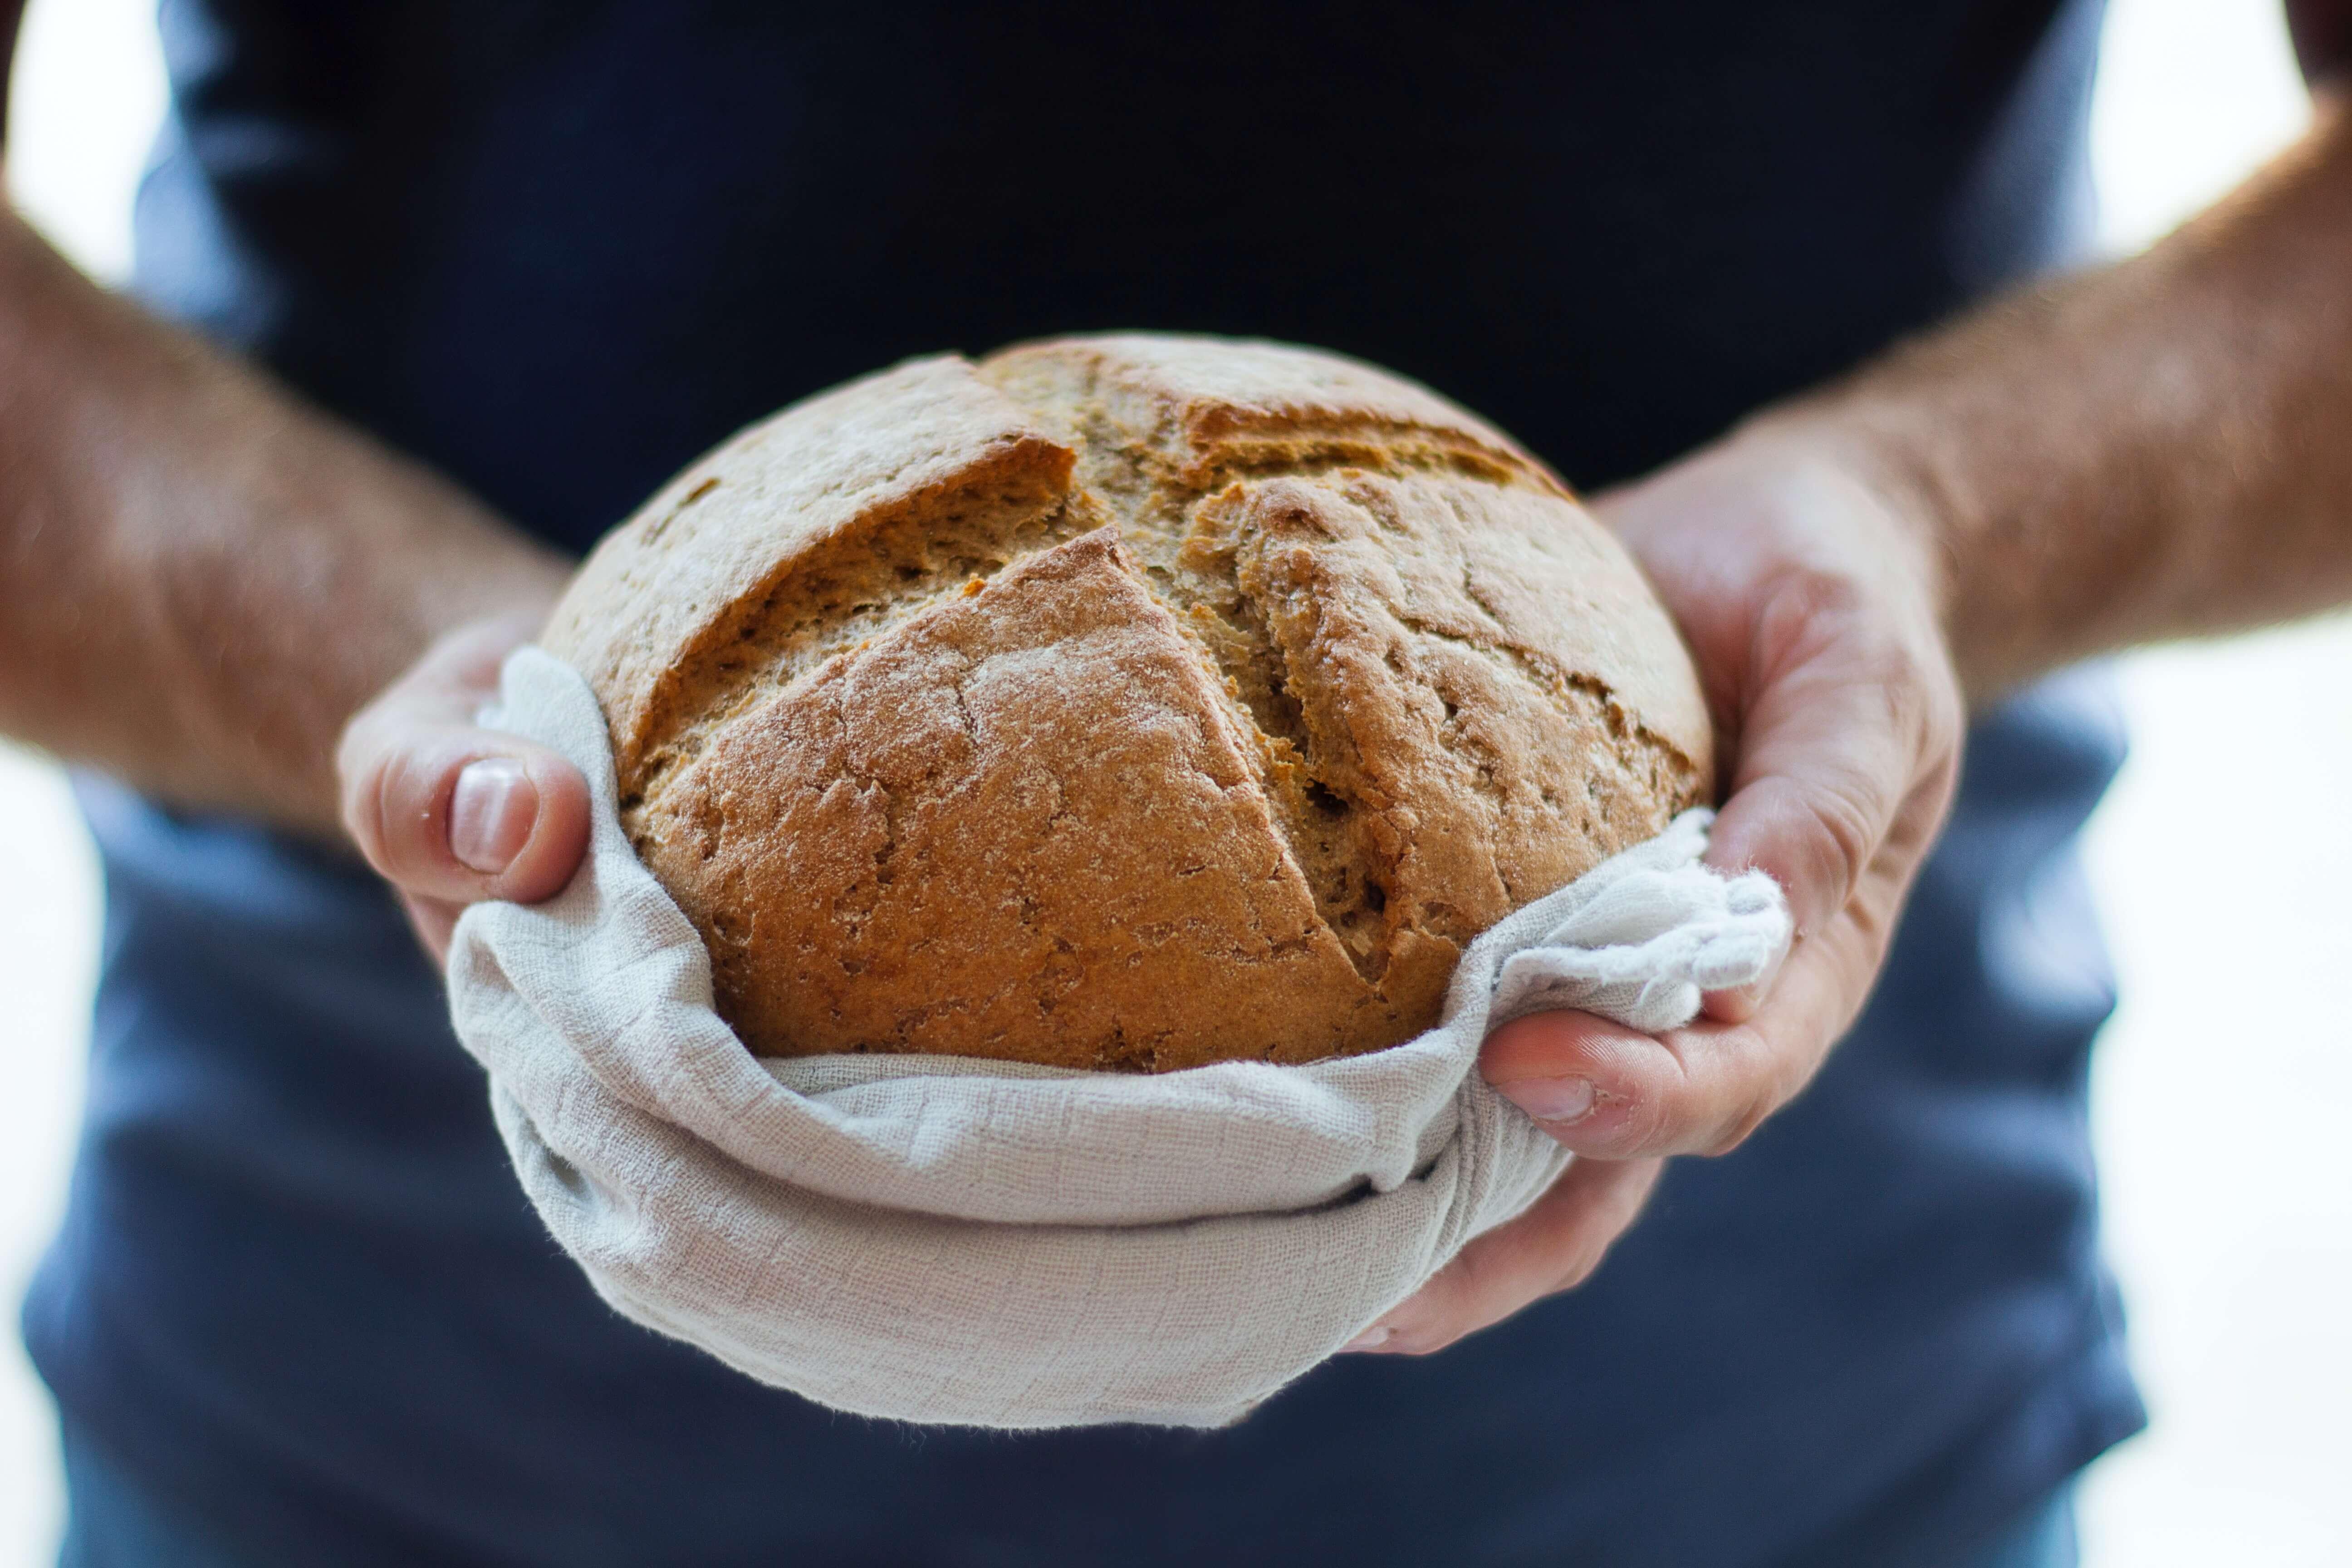 Storing bread in the fridge